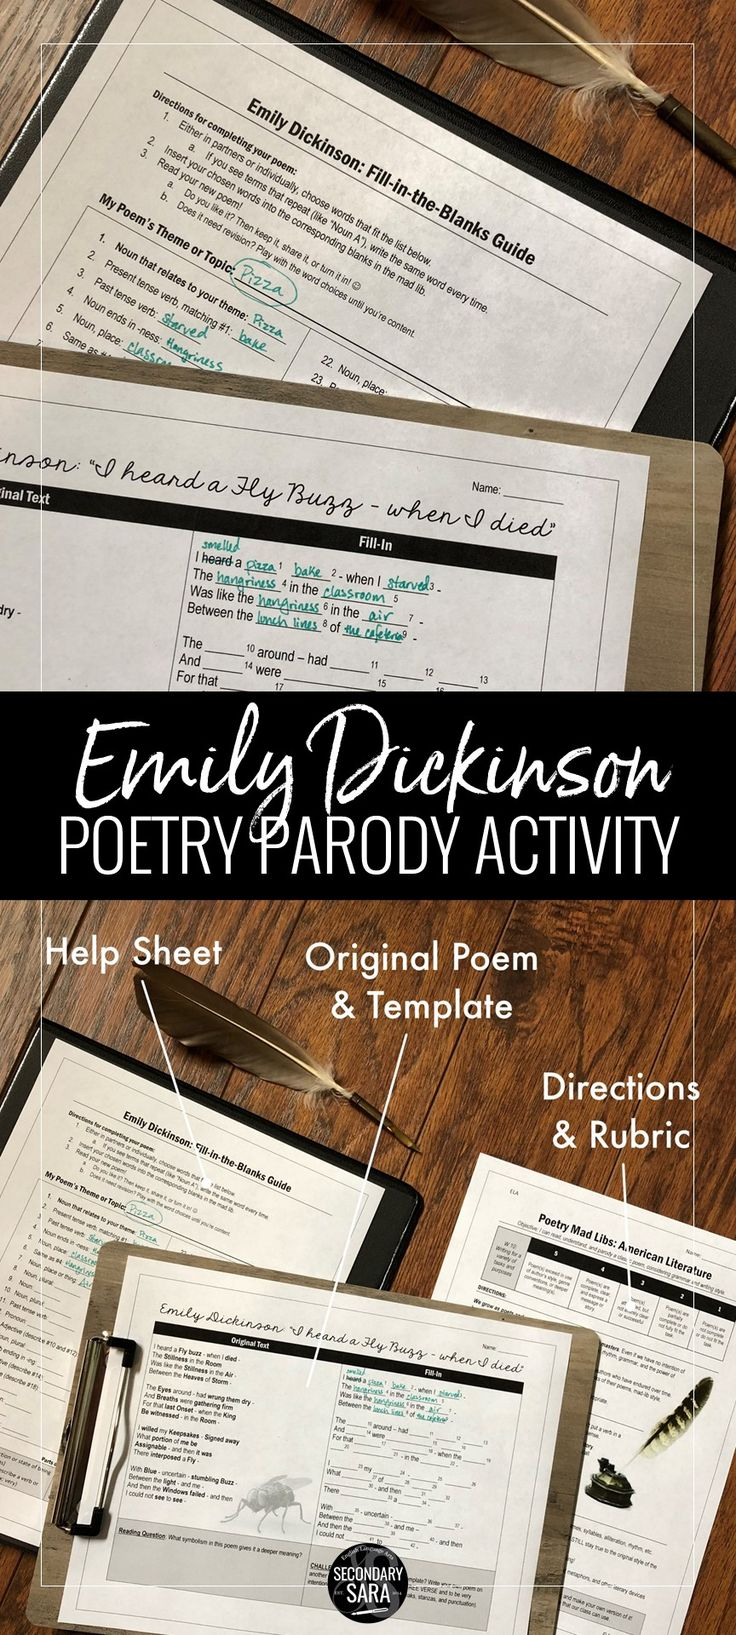 Emily Dickinson Poetry Parody I Heard a